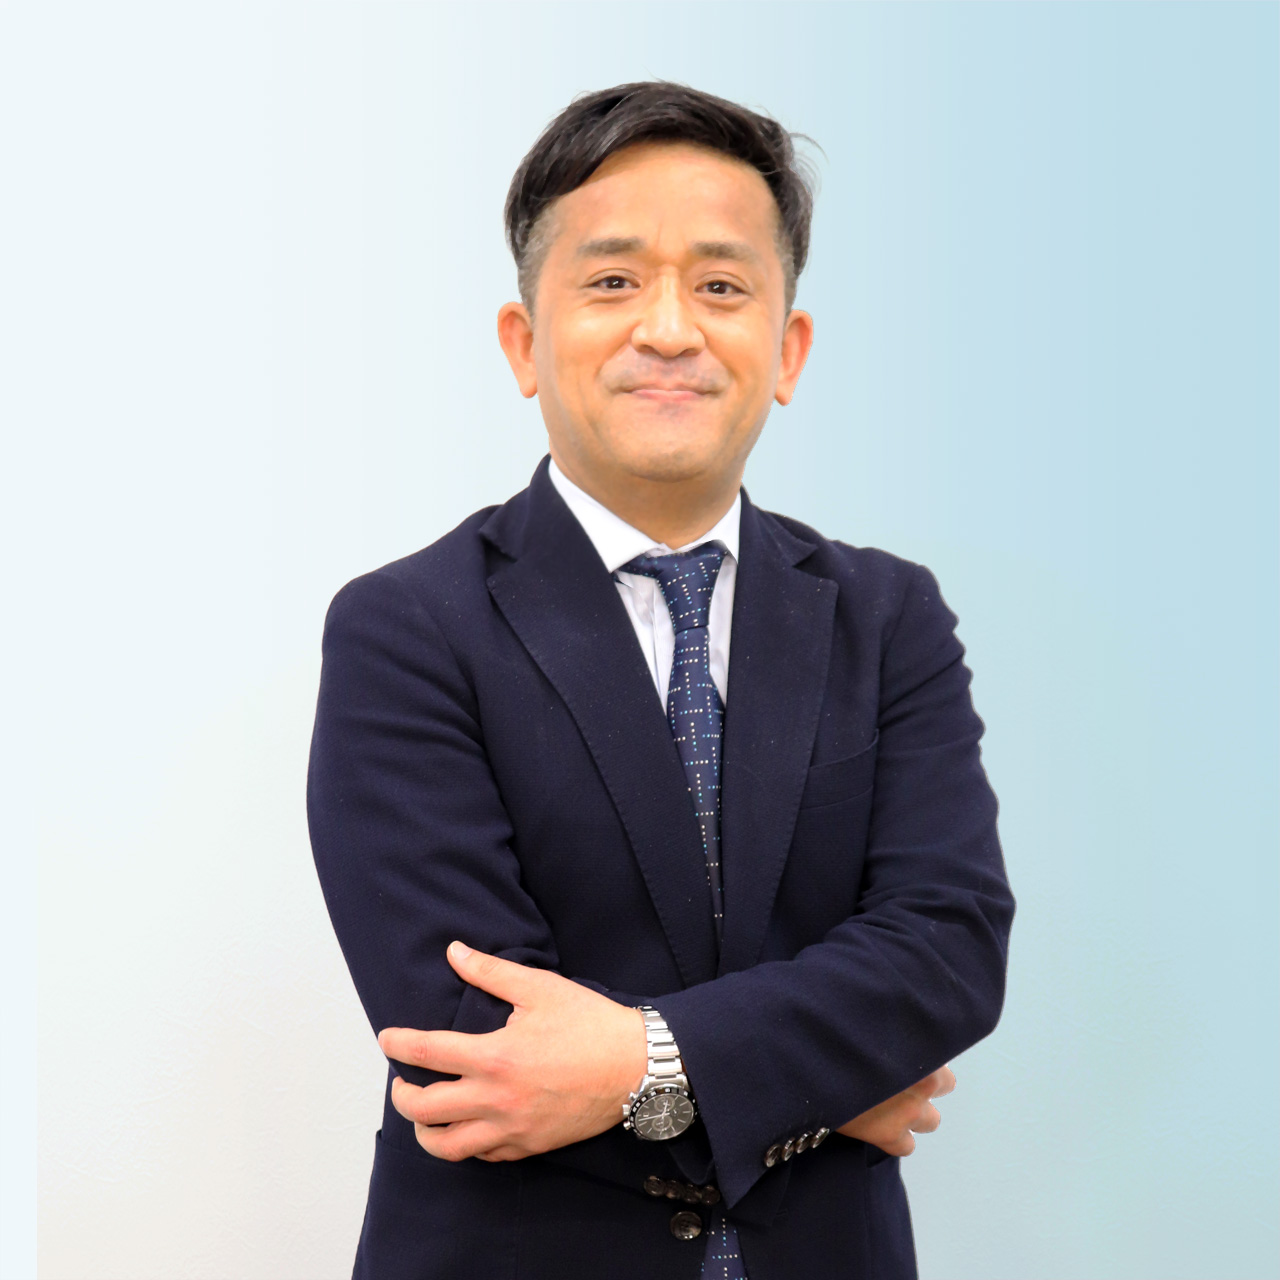 ITソリューションチーム:浅川 綱次